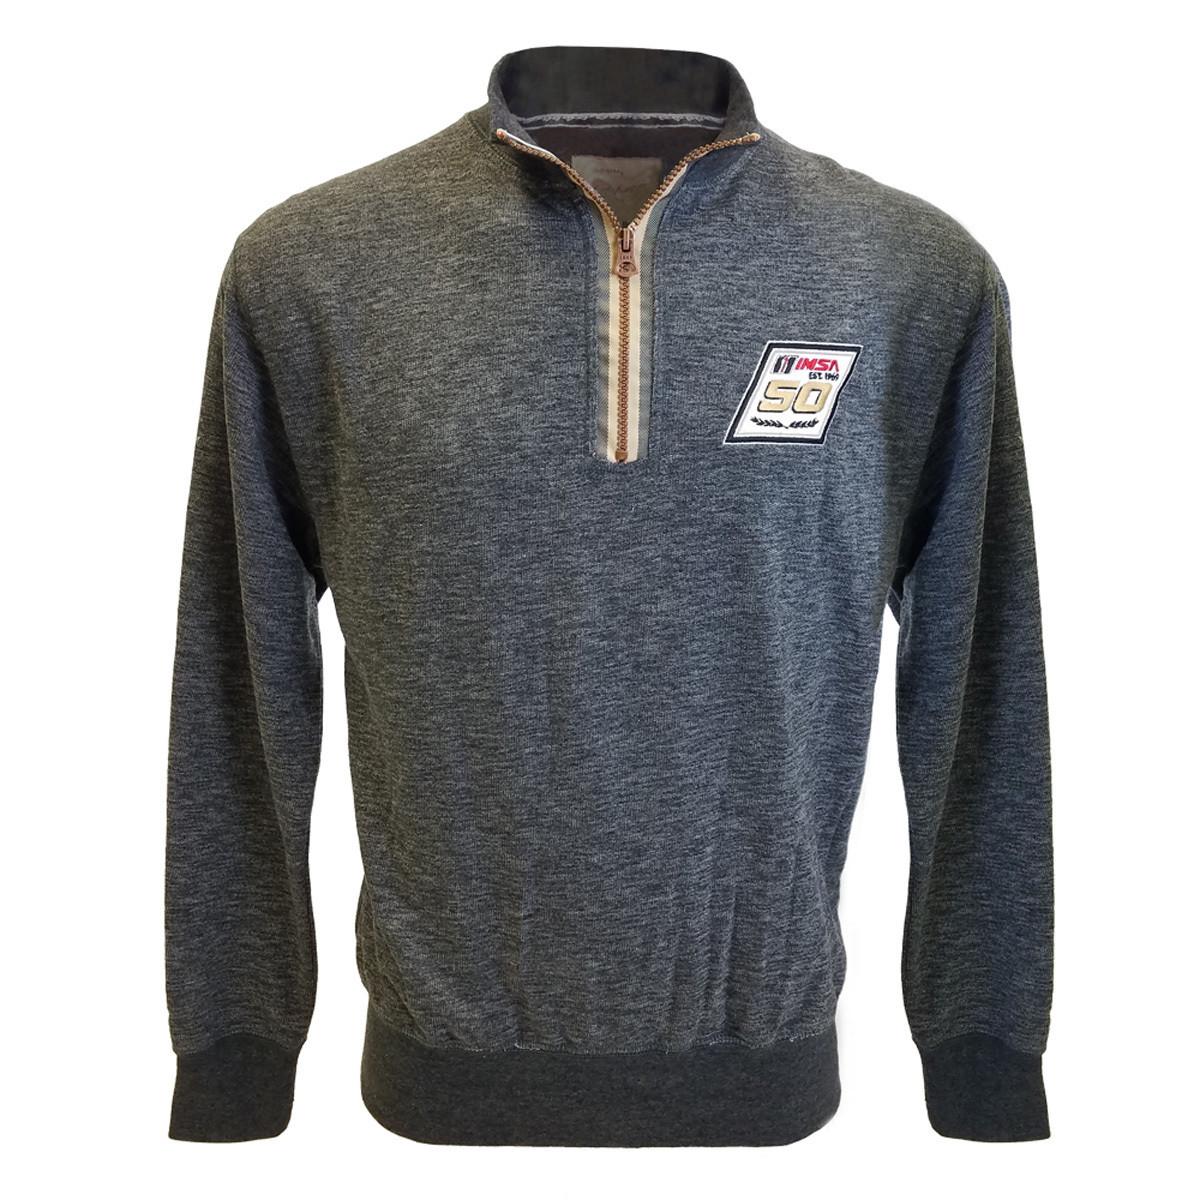 IMSA 50th Vintage 1/4 Zip Fleece